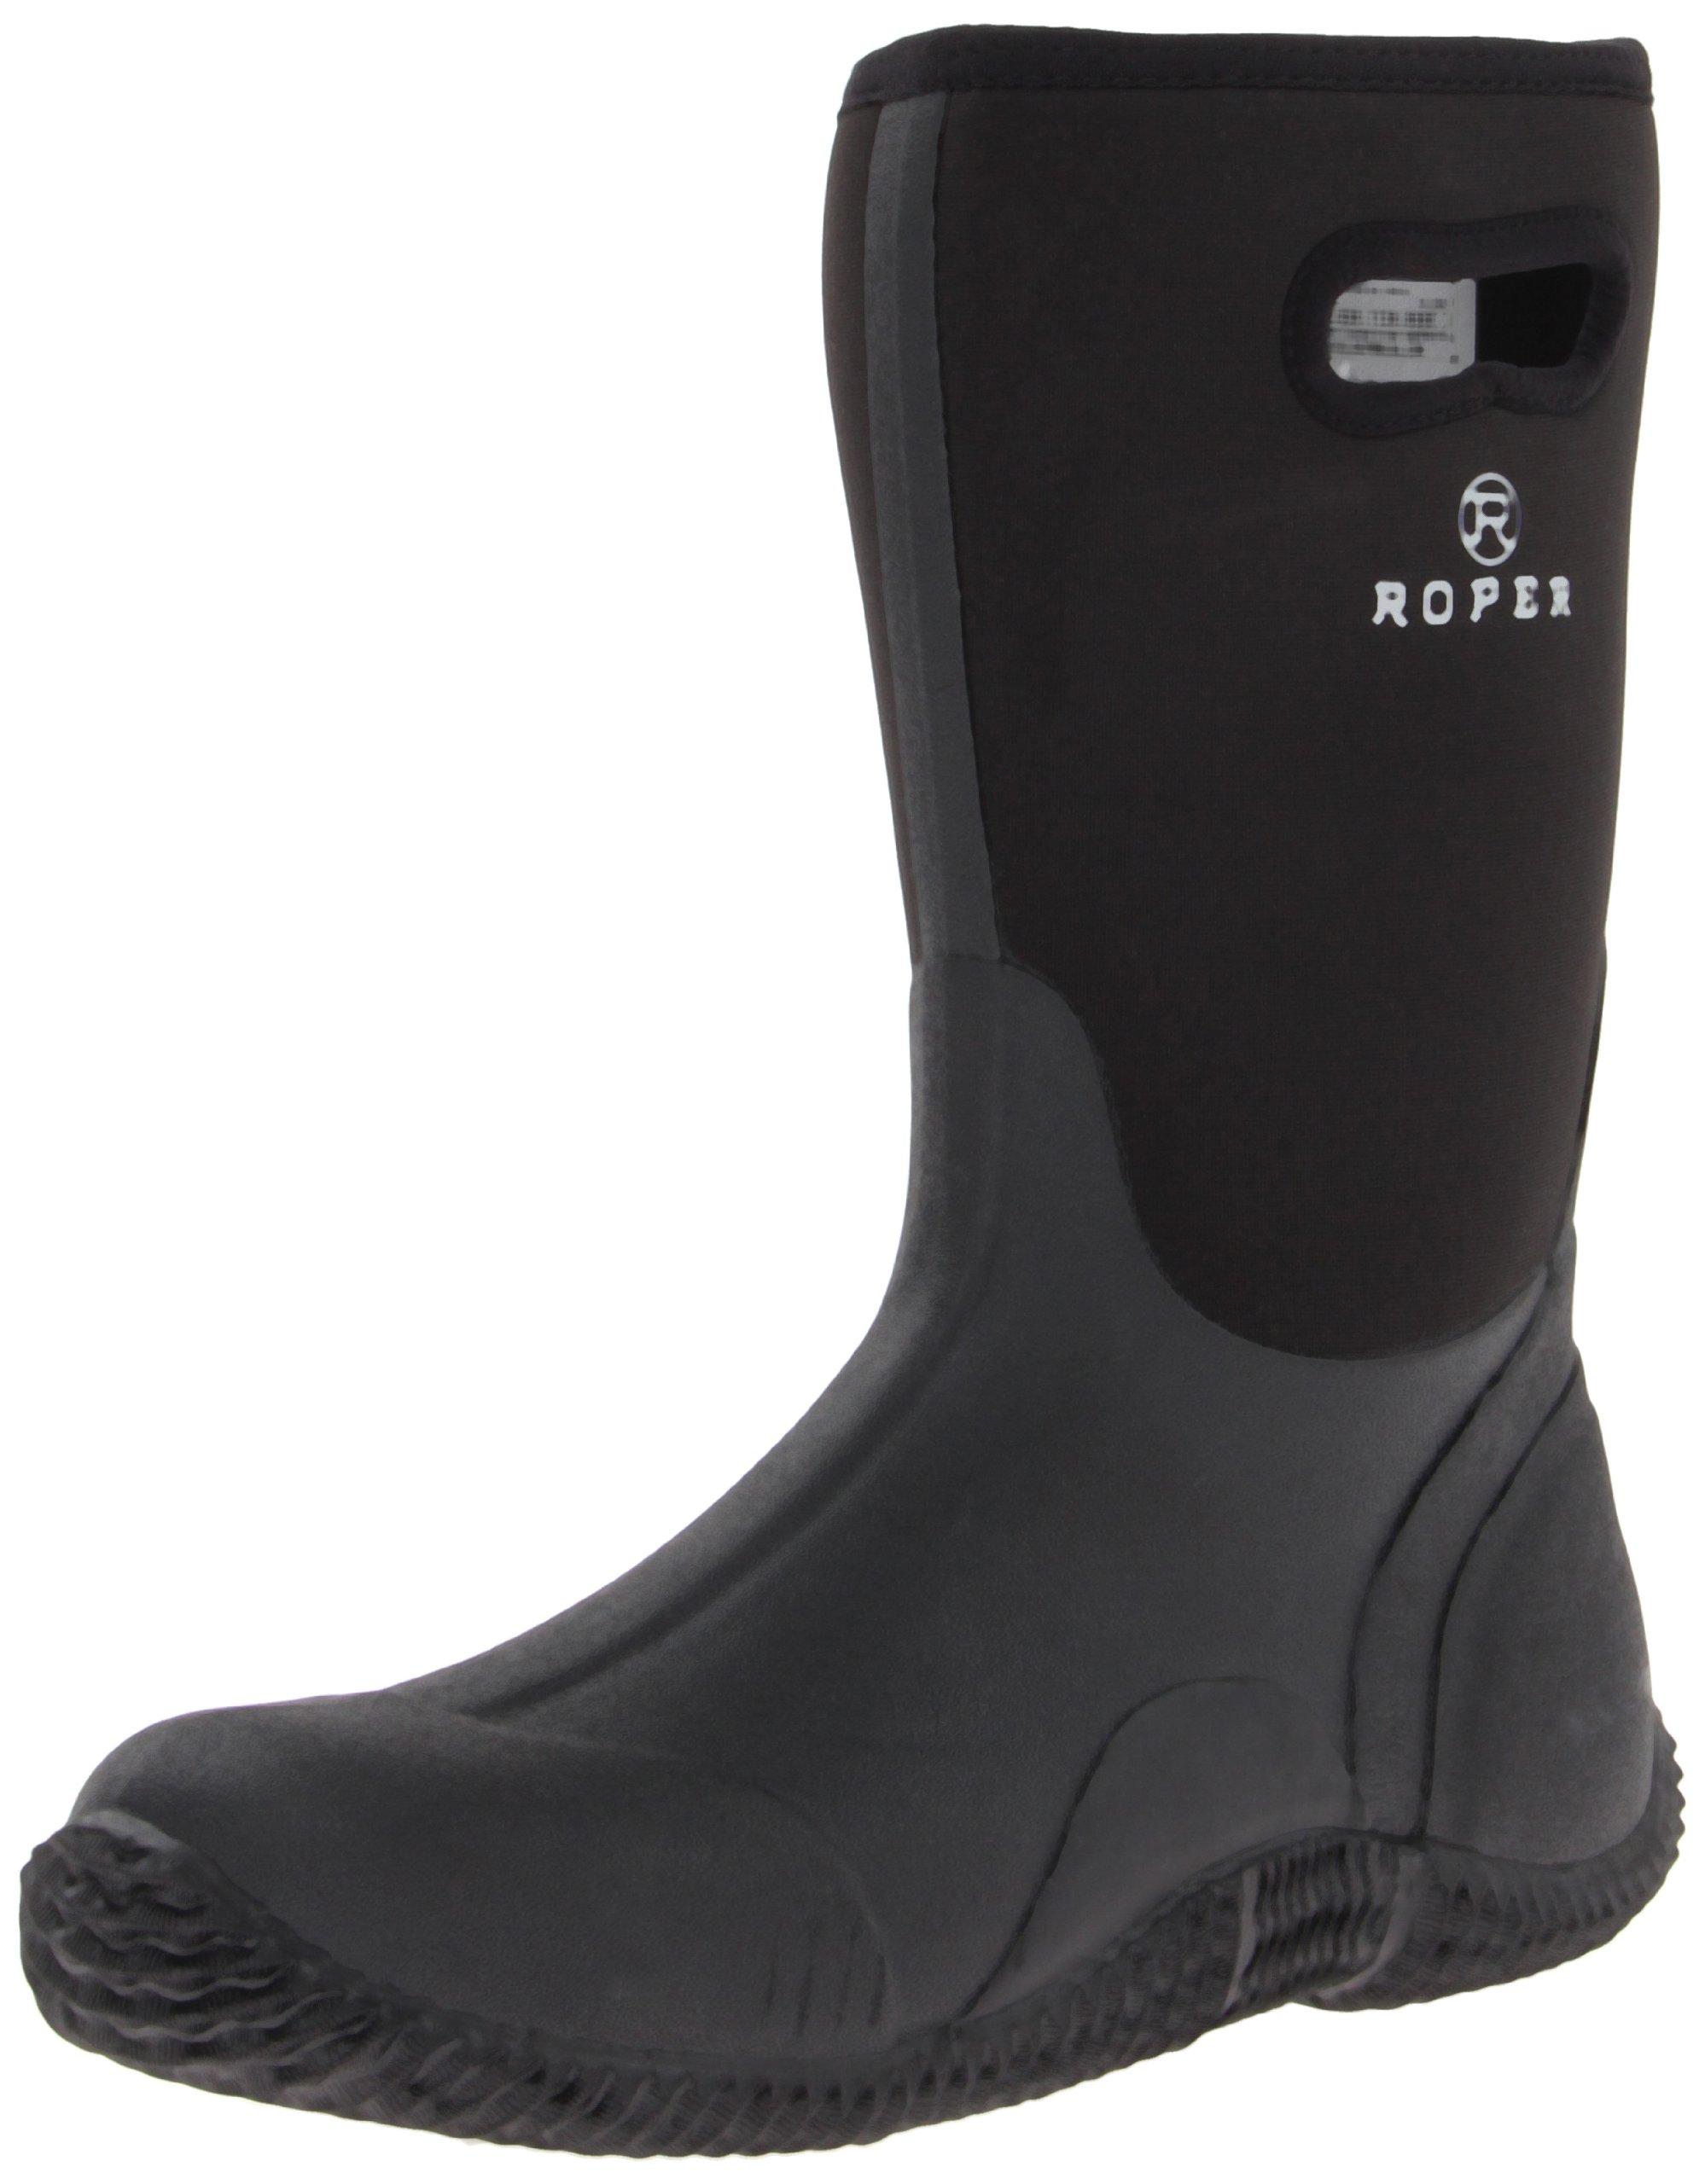 Roper Men's Barnyard Boot Black 11 D - Medium